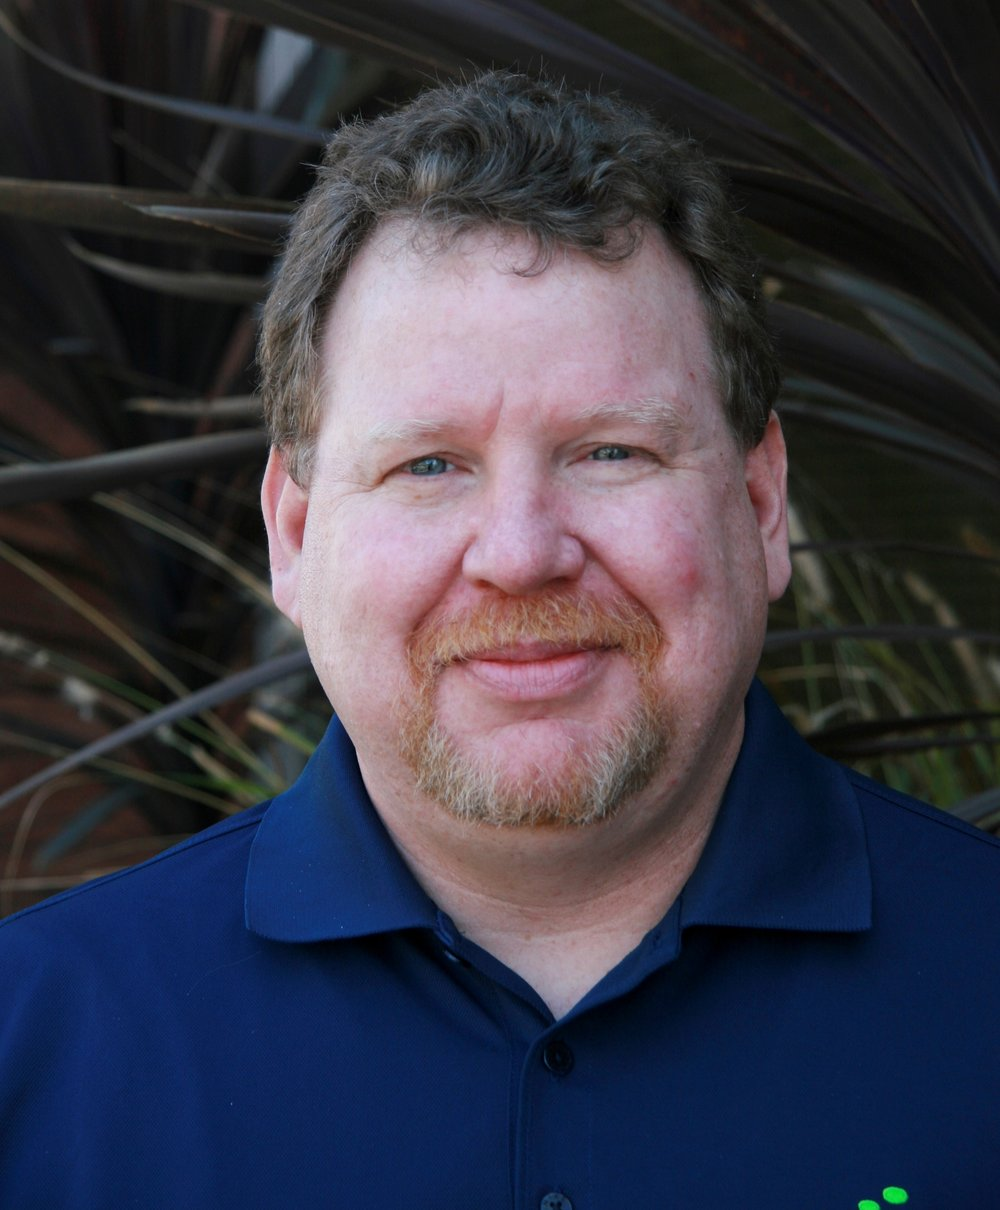 David Garfinkel DGarfinkel@TopSpeedData.com (707) 297-9072